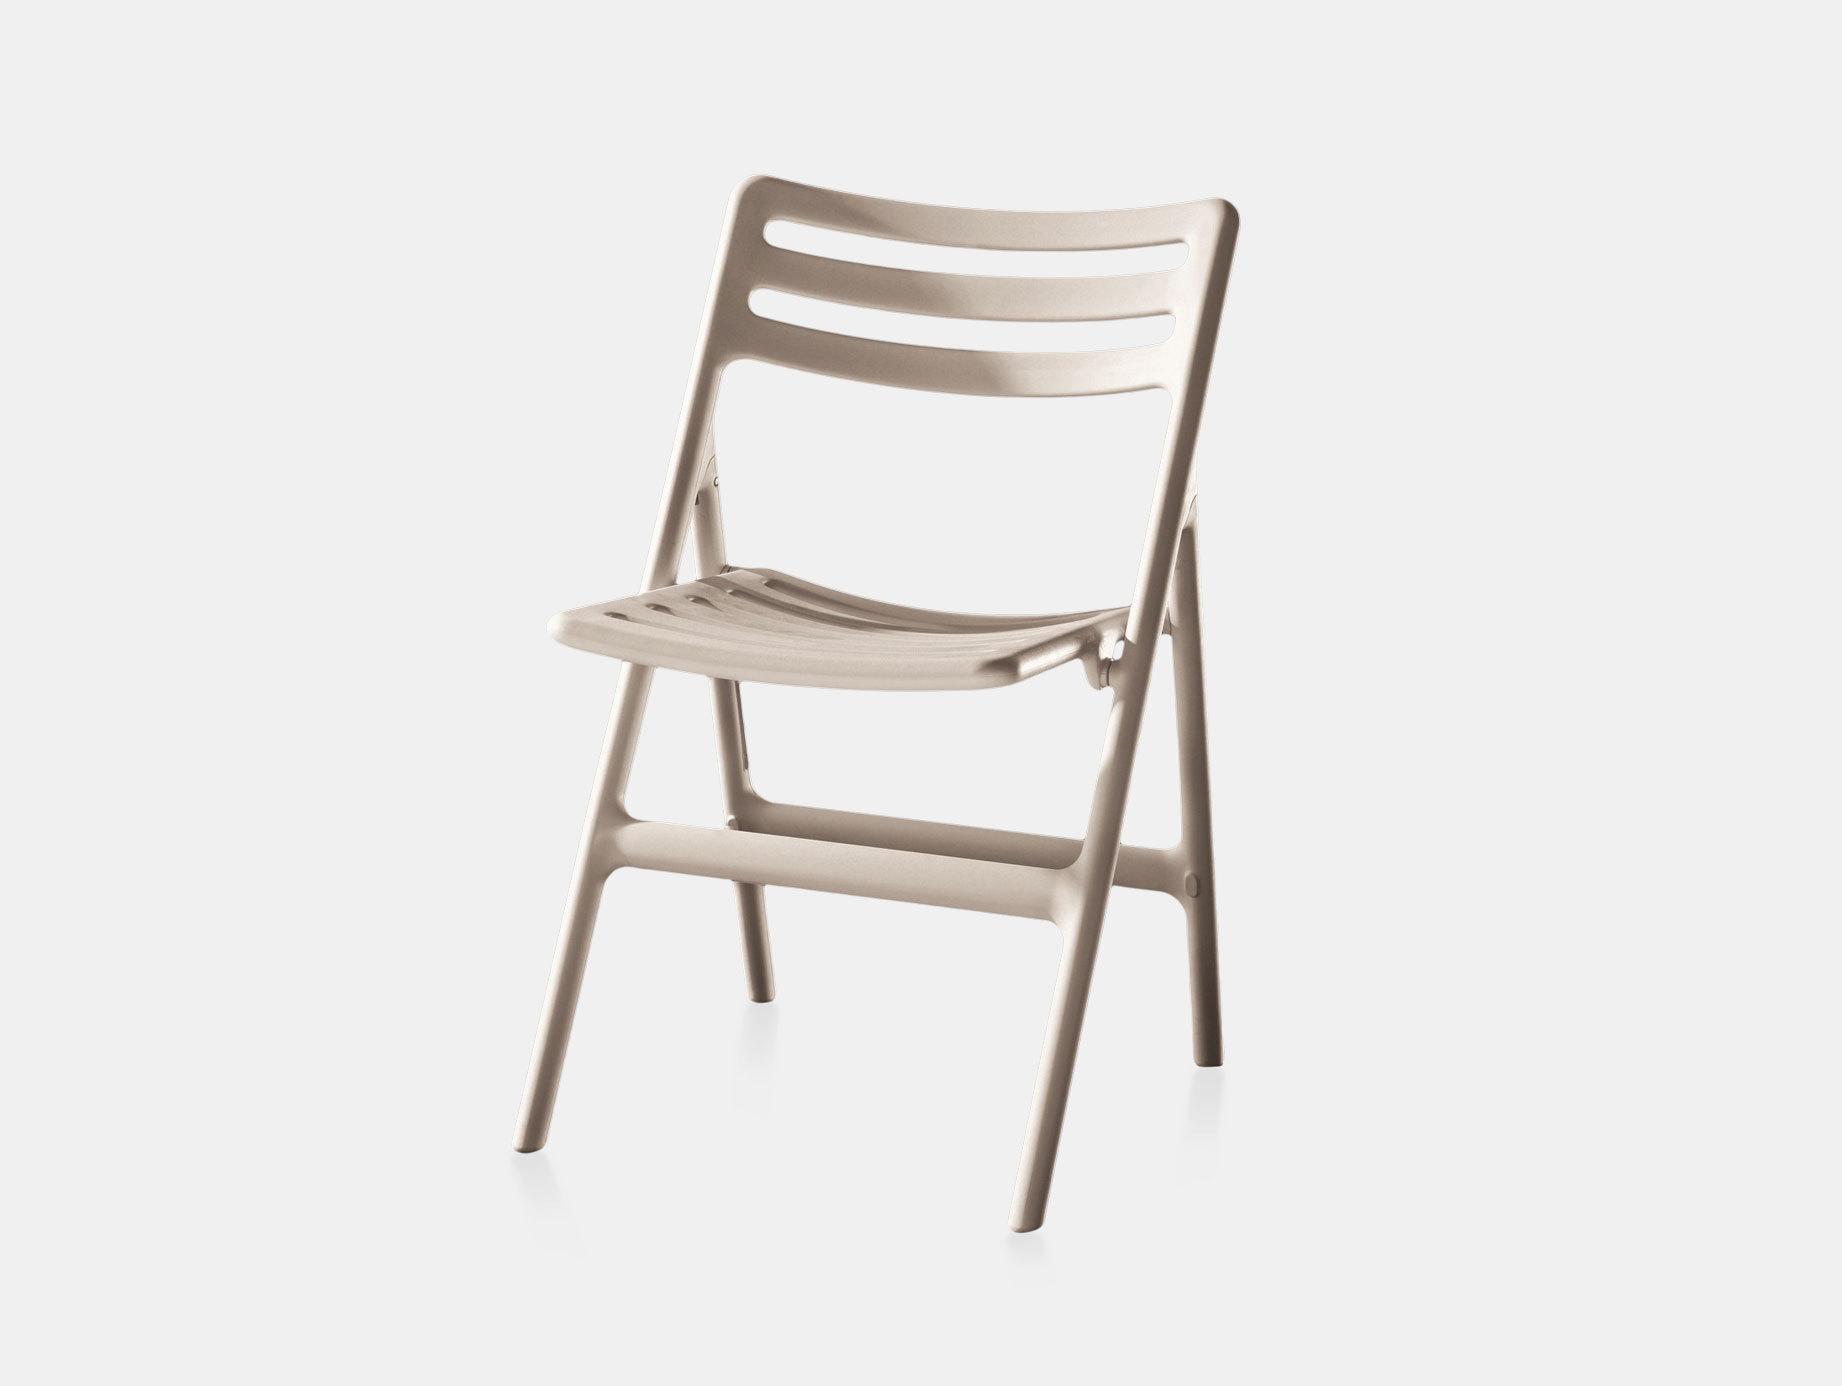 Folding Air Chair image 1